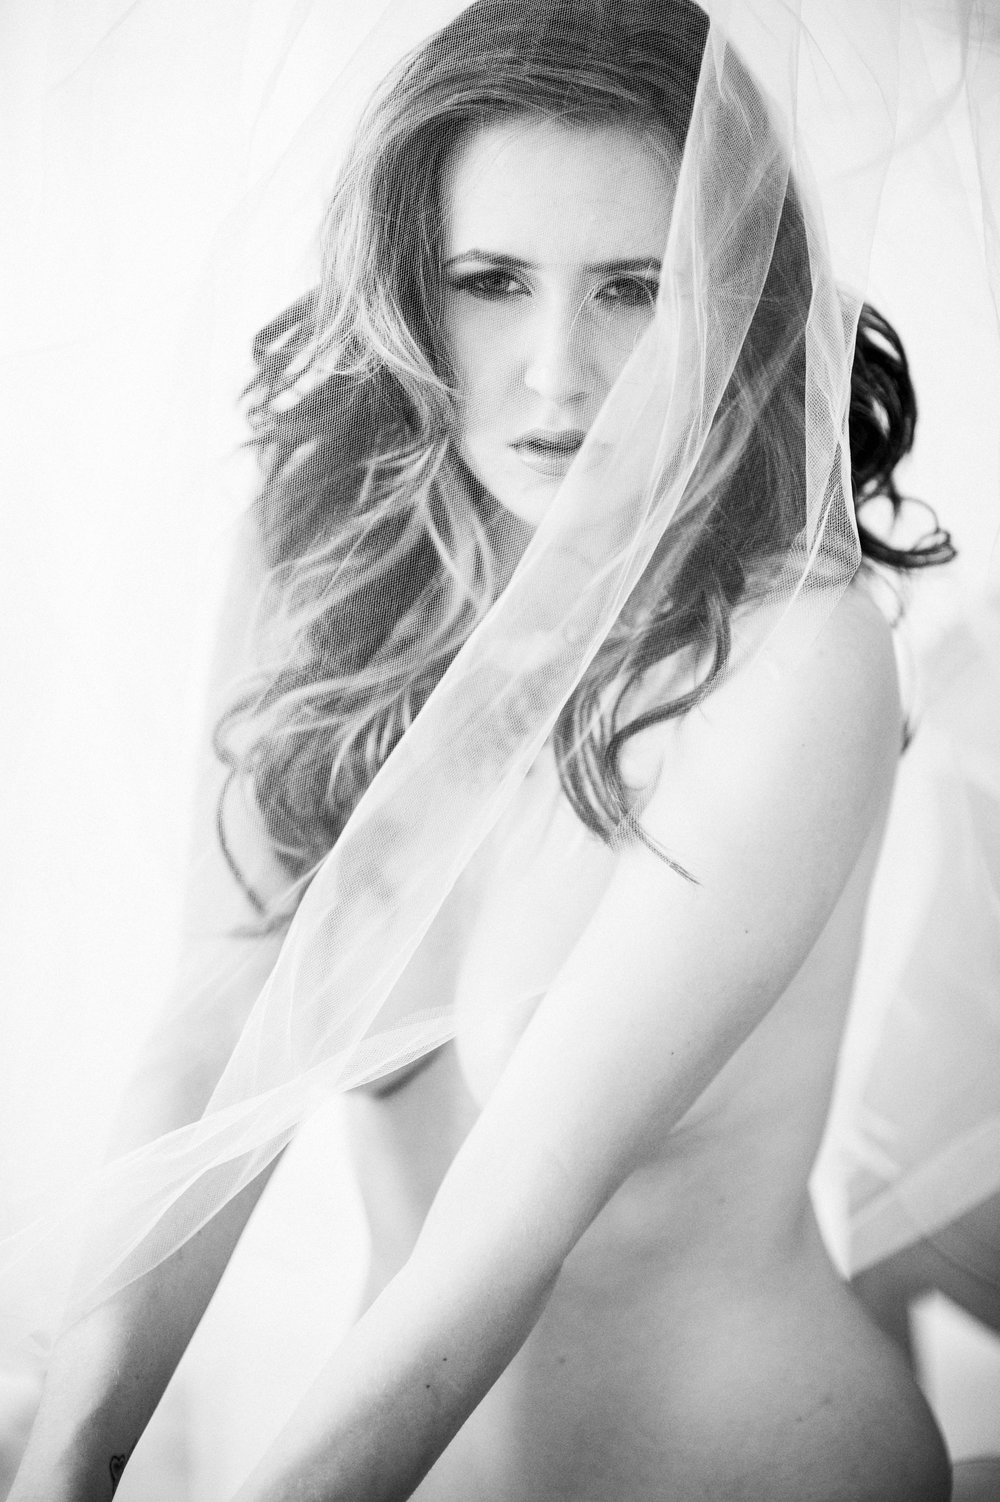 Marta-Hewson-Kristina-Jovanovic-boudoir-nude-figure-veil.jpg